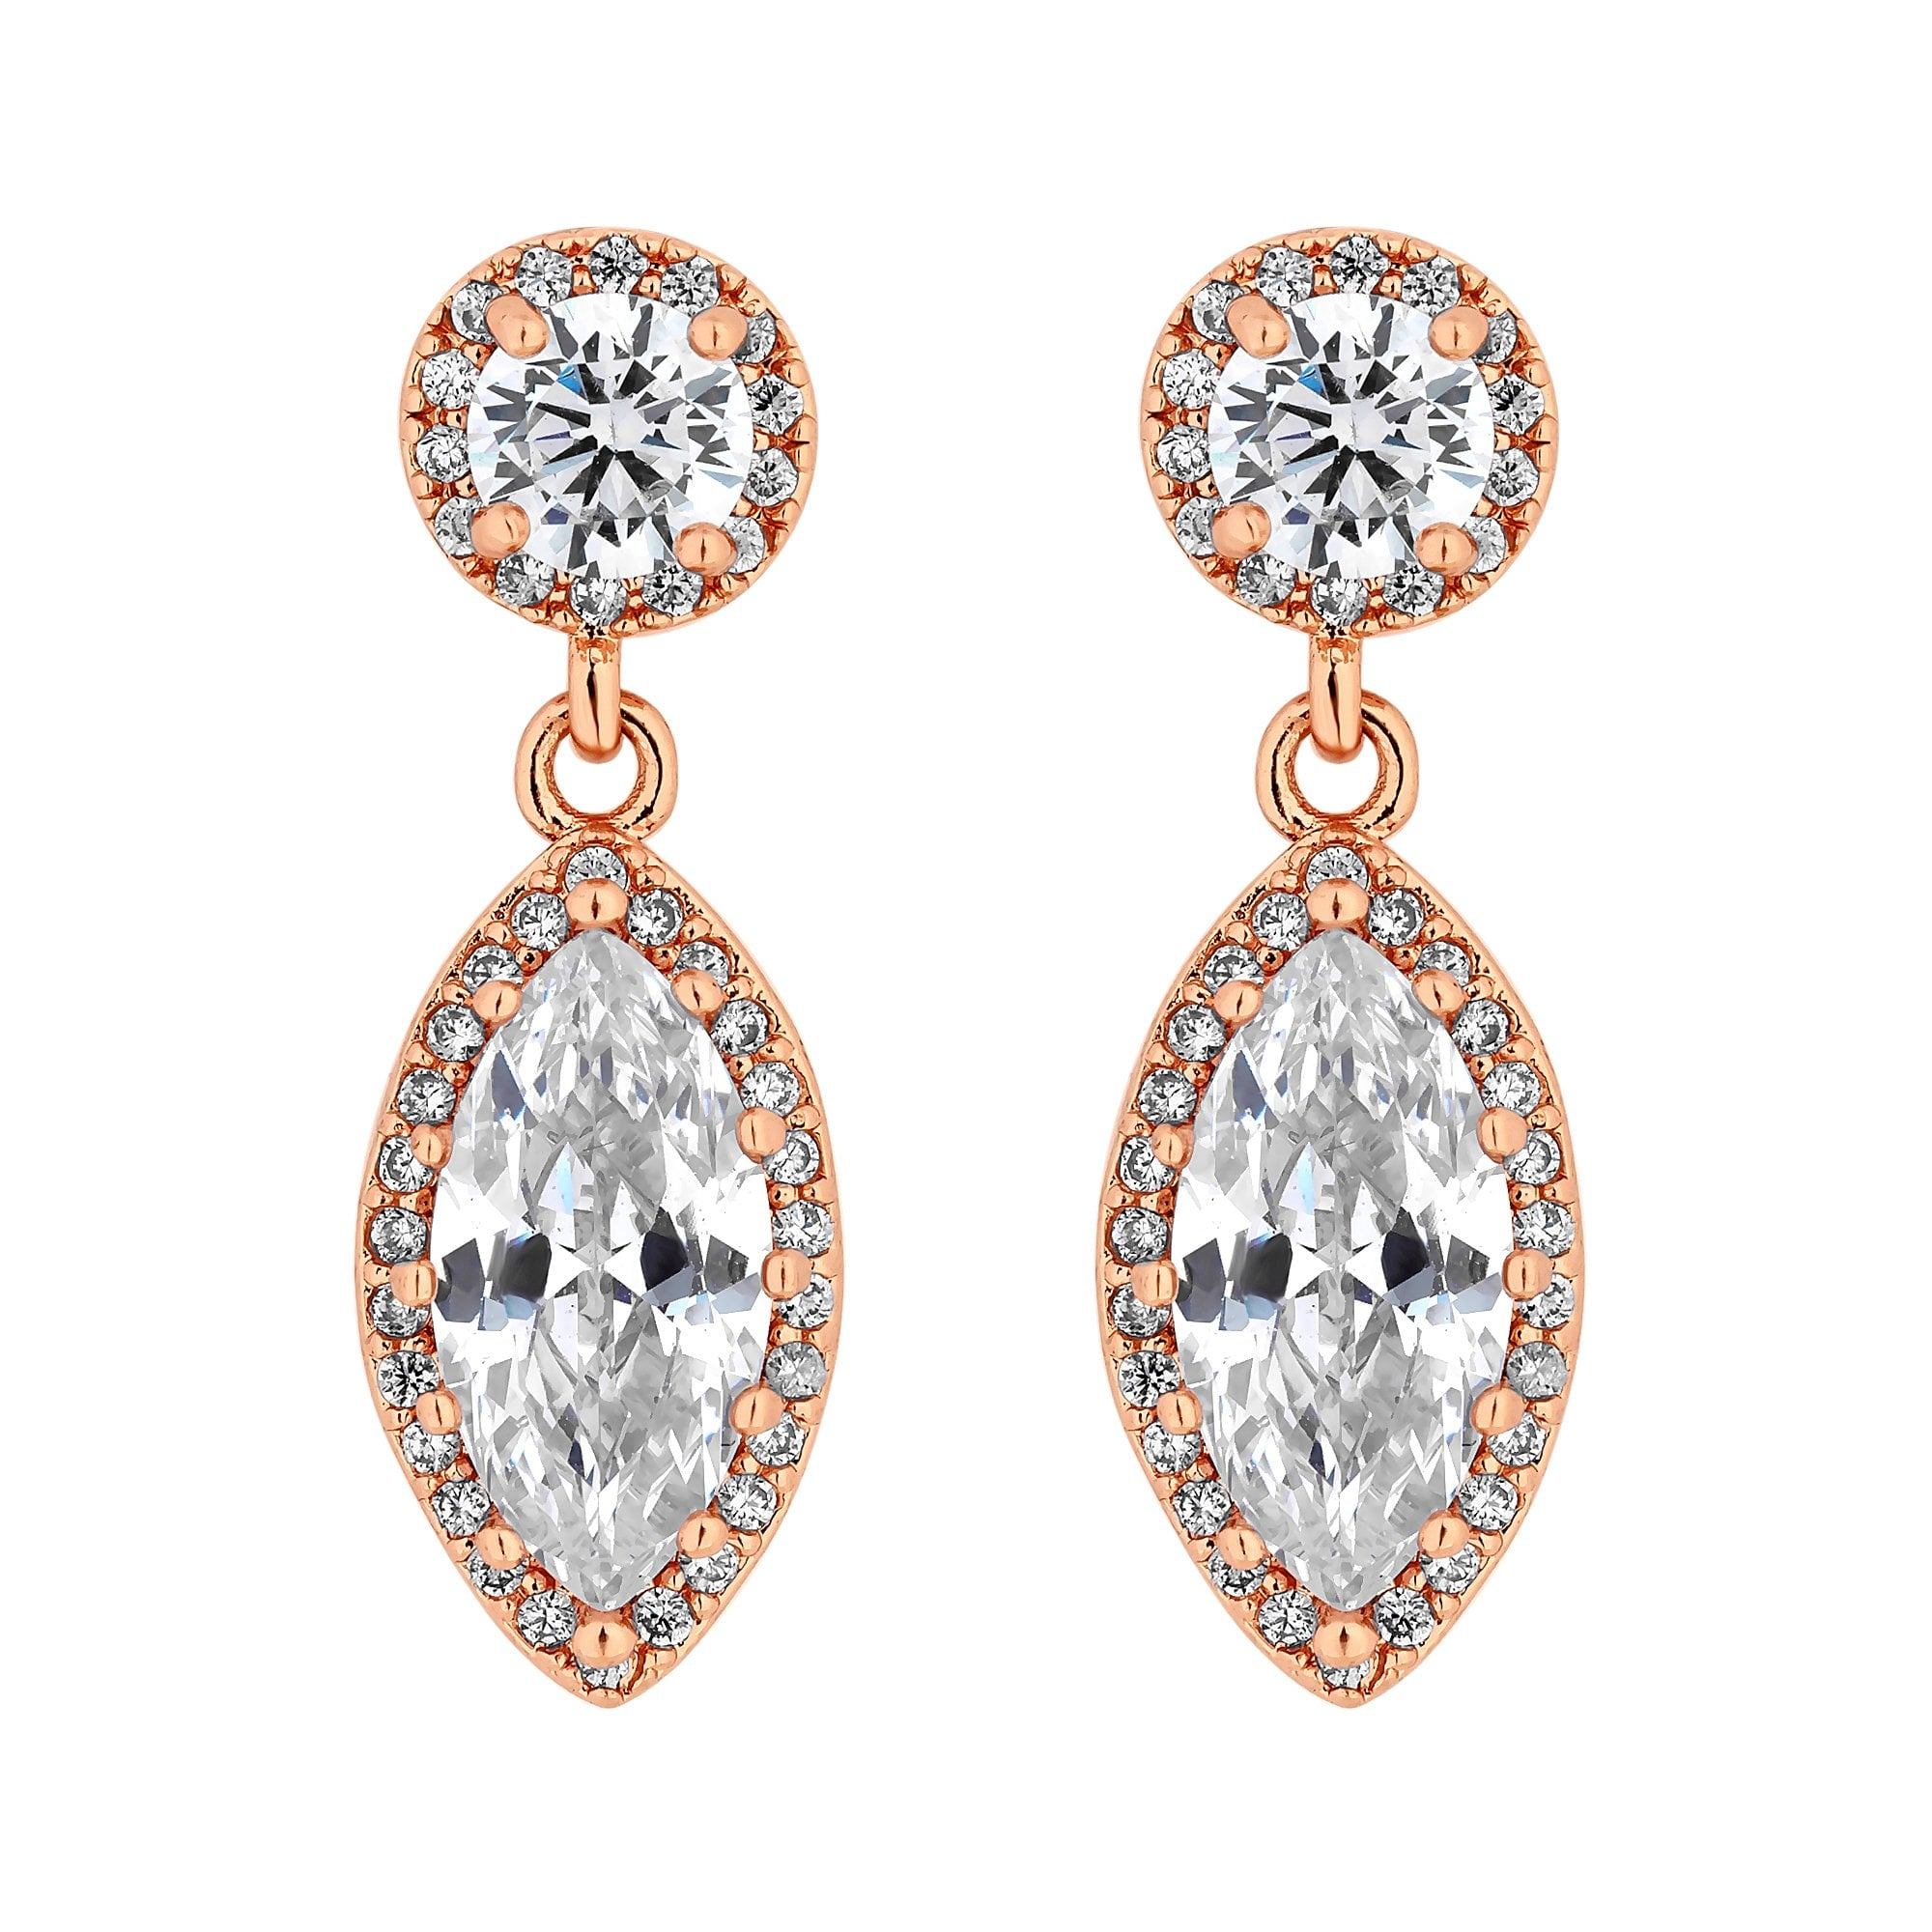 95230085b46e4 Rose Gold Plated Clear Cubic Zirconia Teardrop Drop Earring